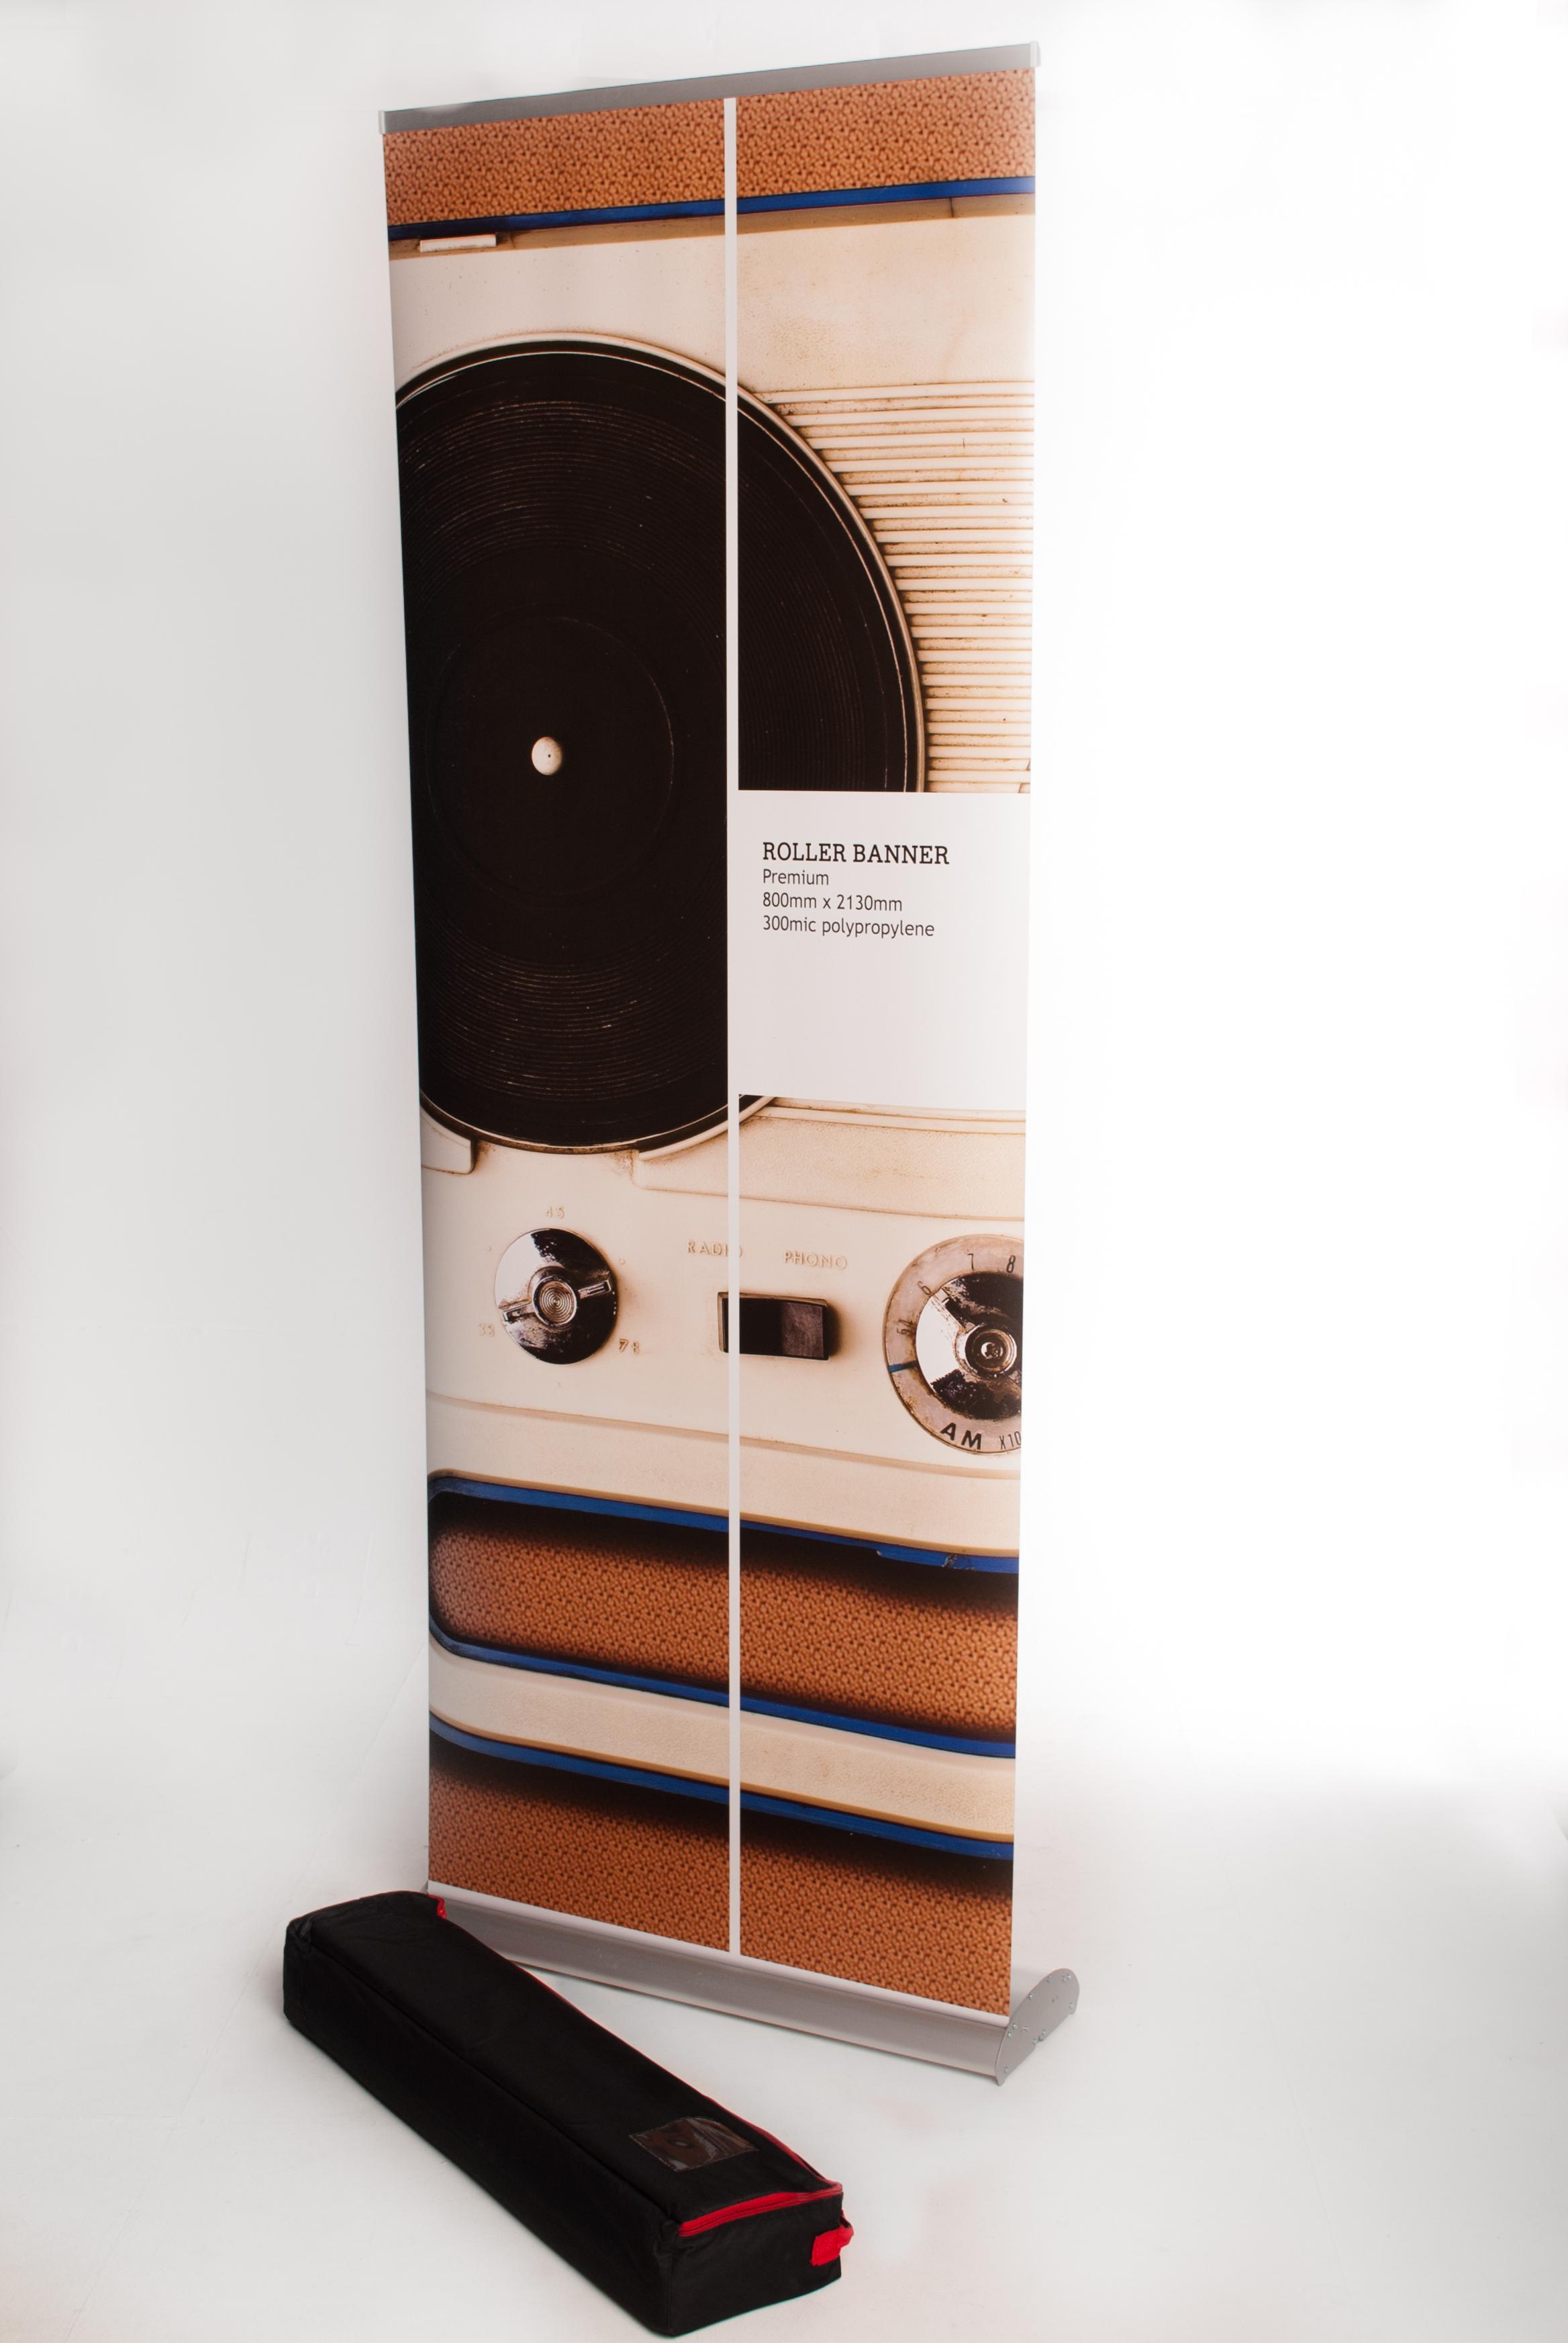 premium-roller-banner-with-case